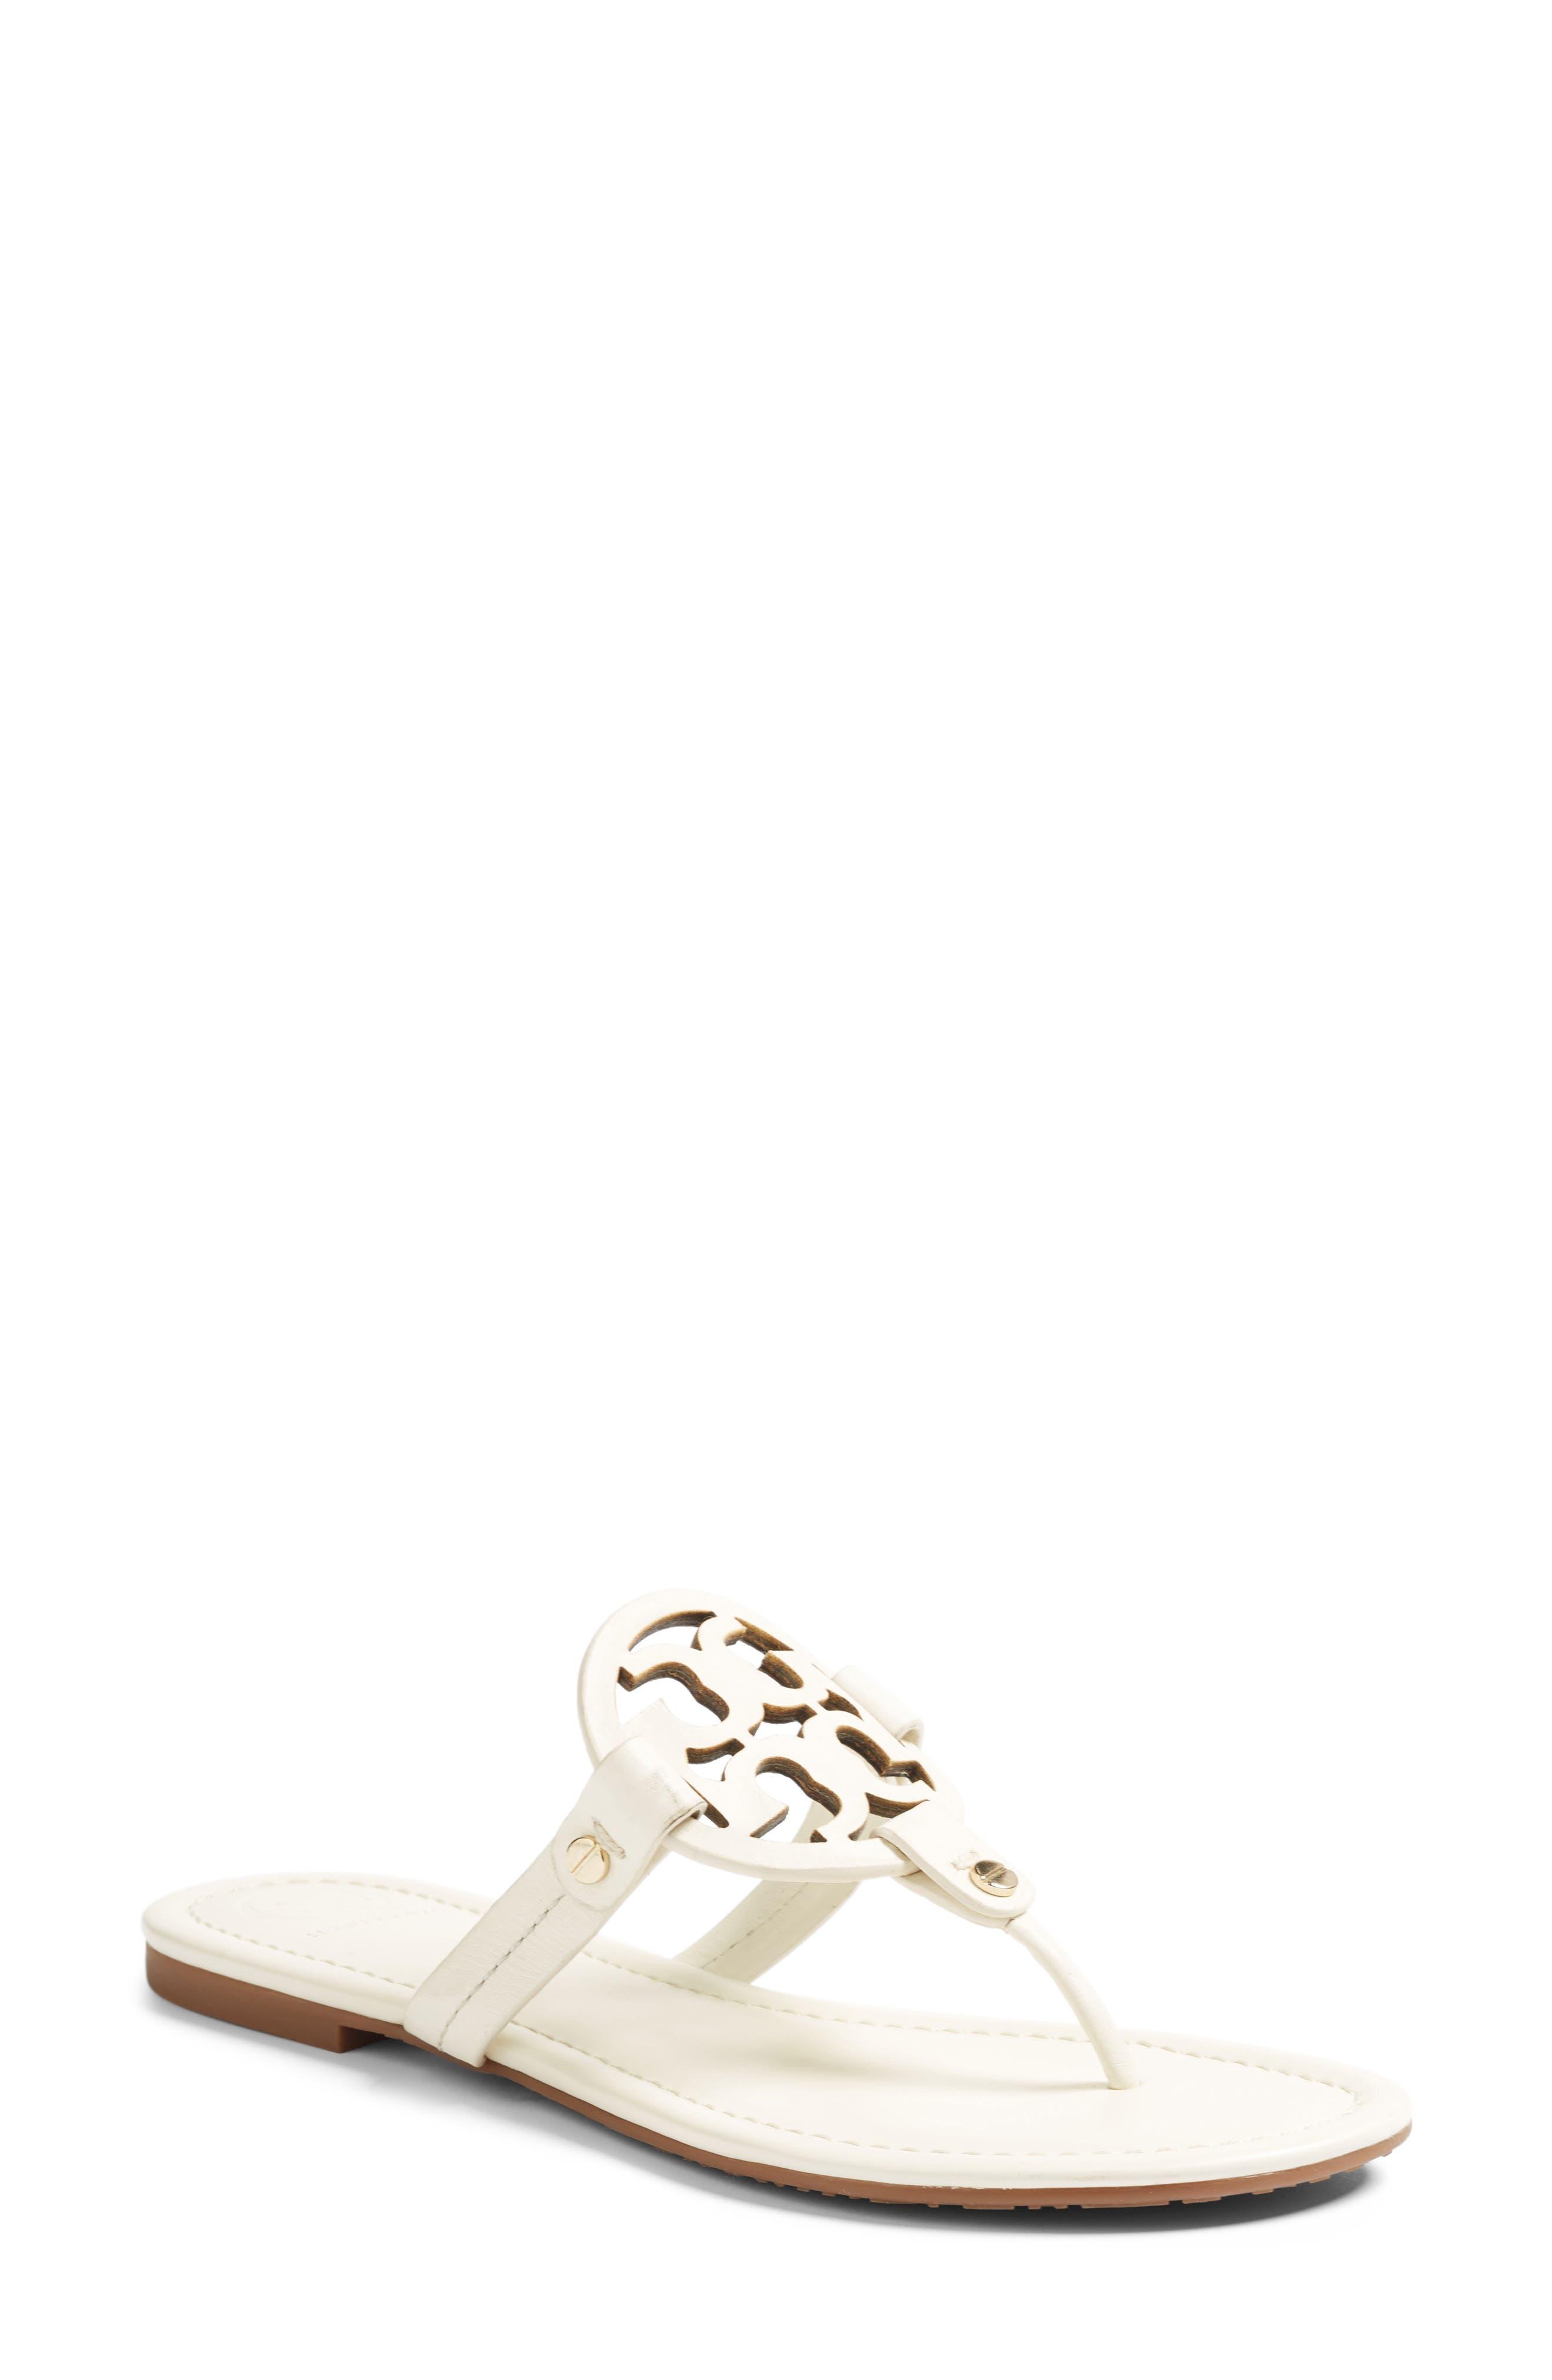 Miller Leather Logo Flat Slide Sandals in Bleach